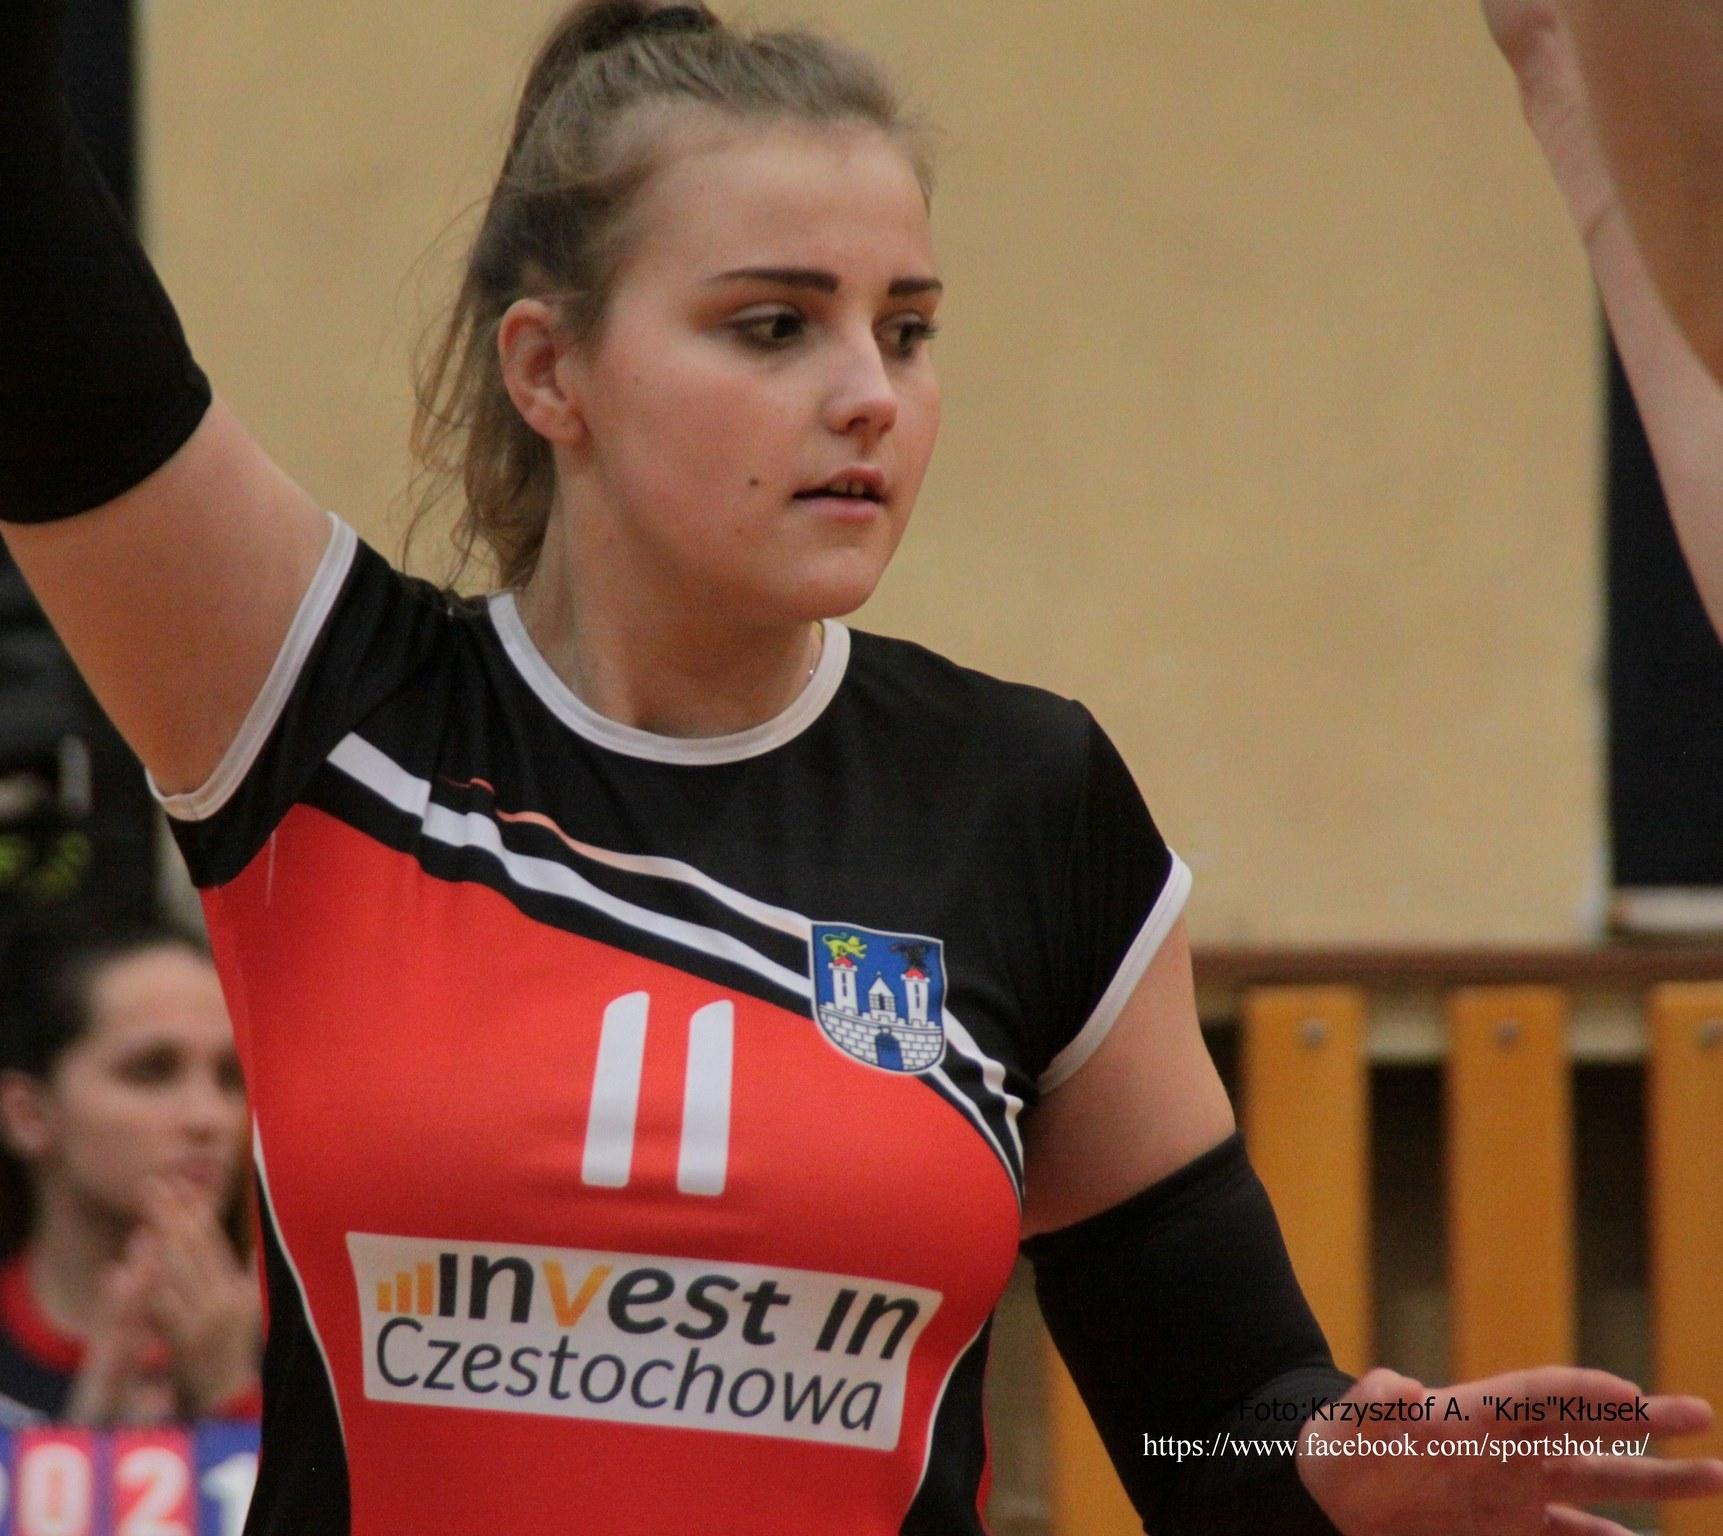 Justyna Sagan